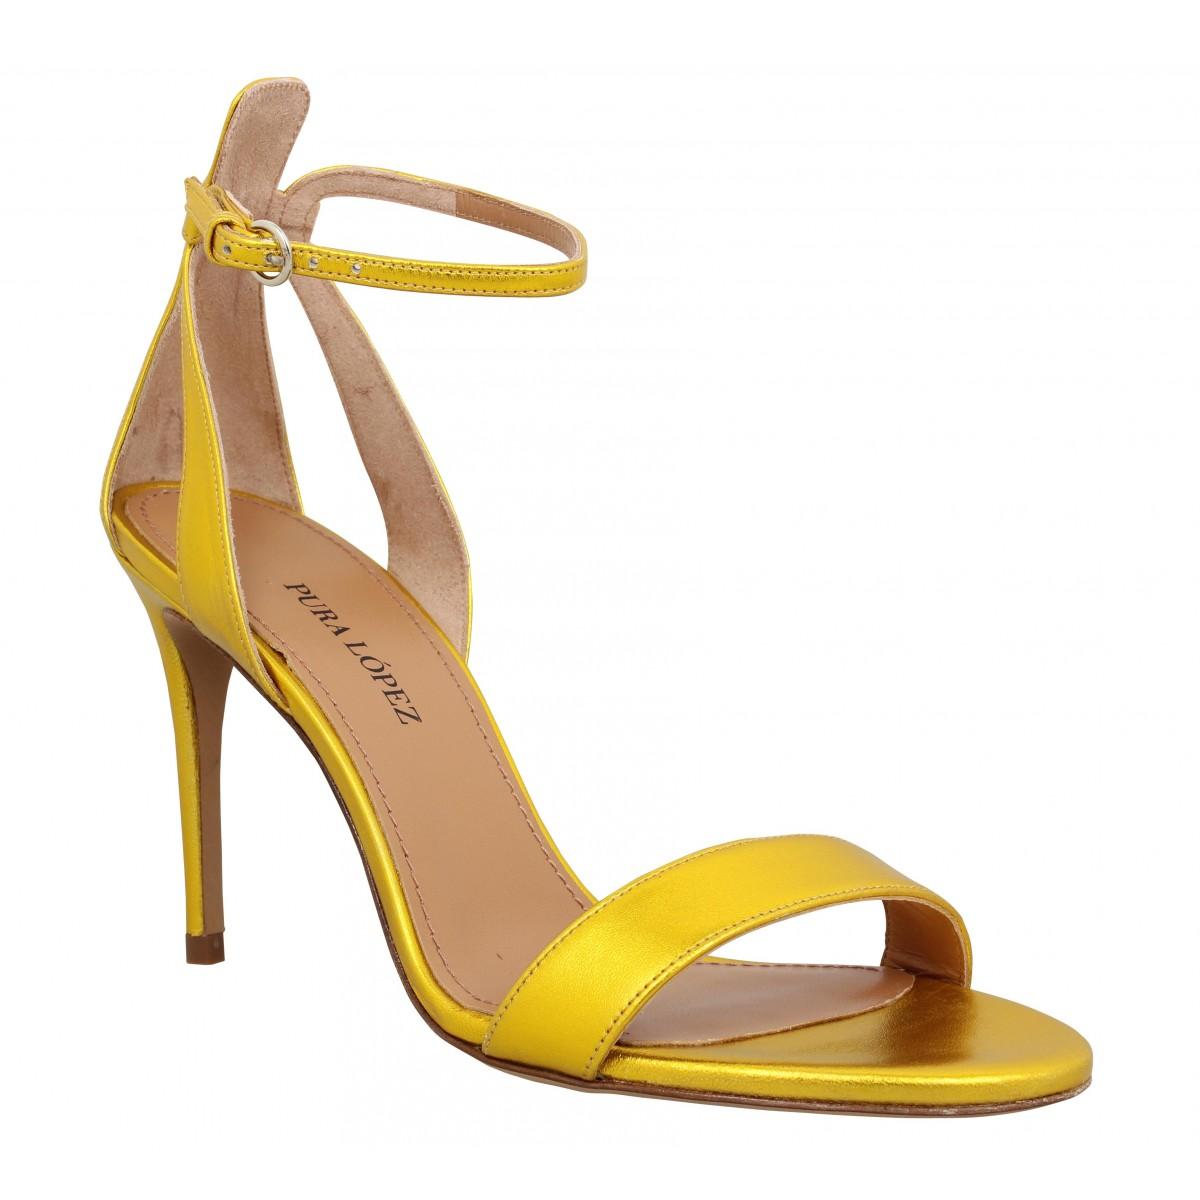 Sandales talons PURA LOPEZ O187 metal Femme Jaune